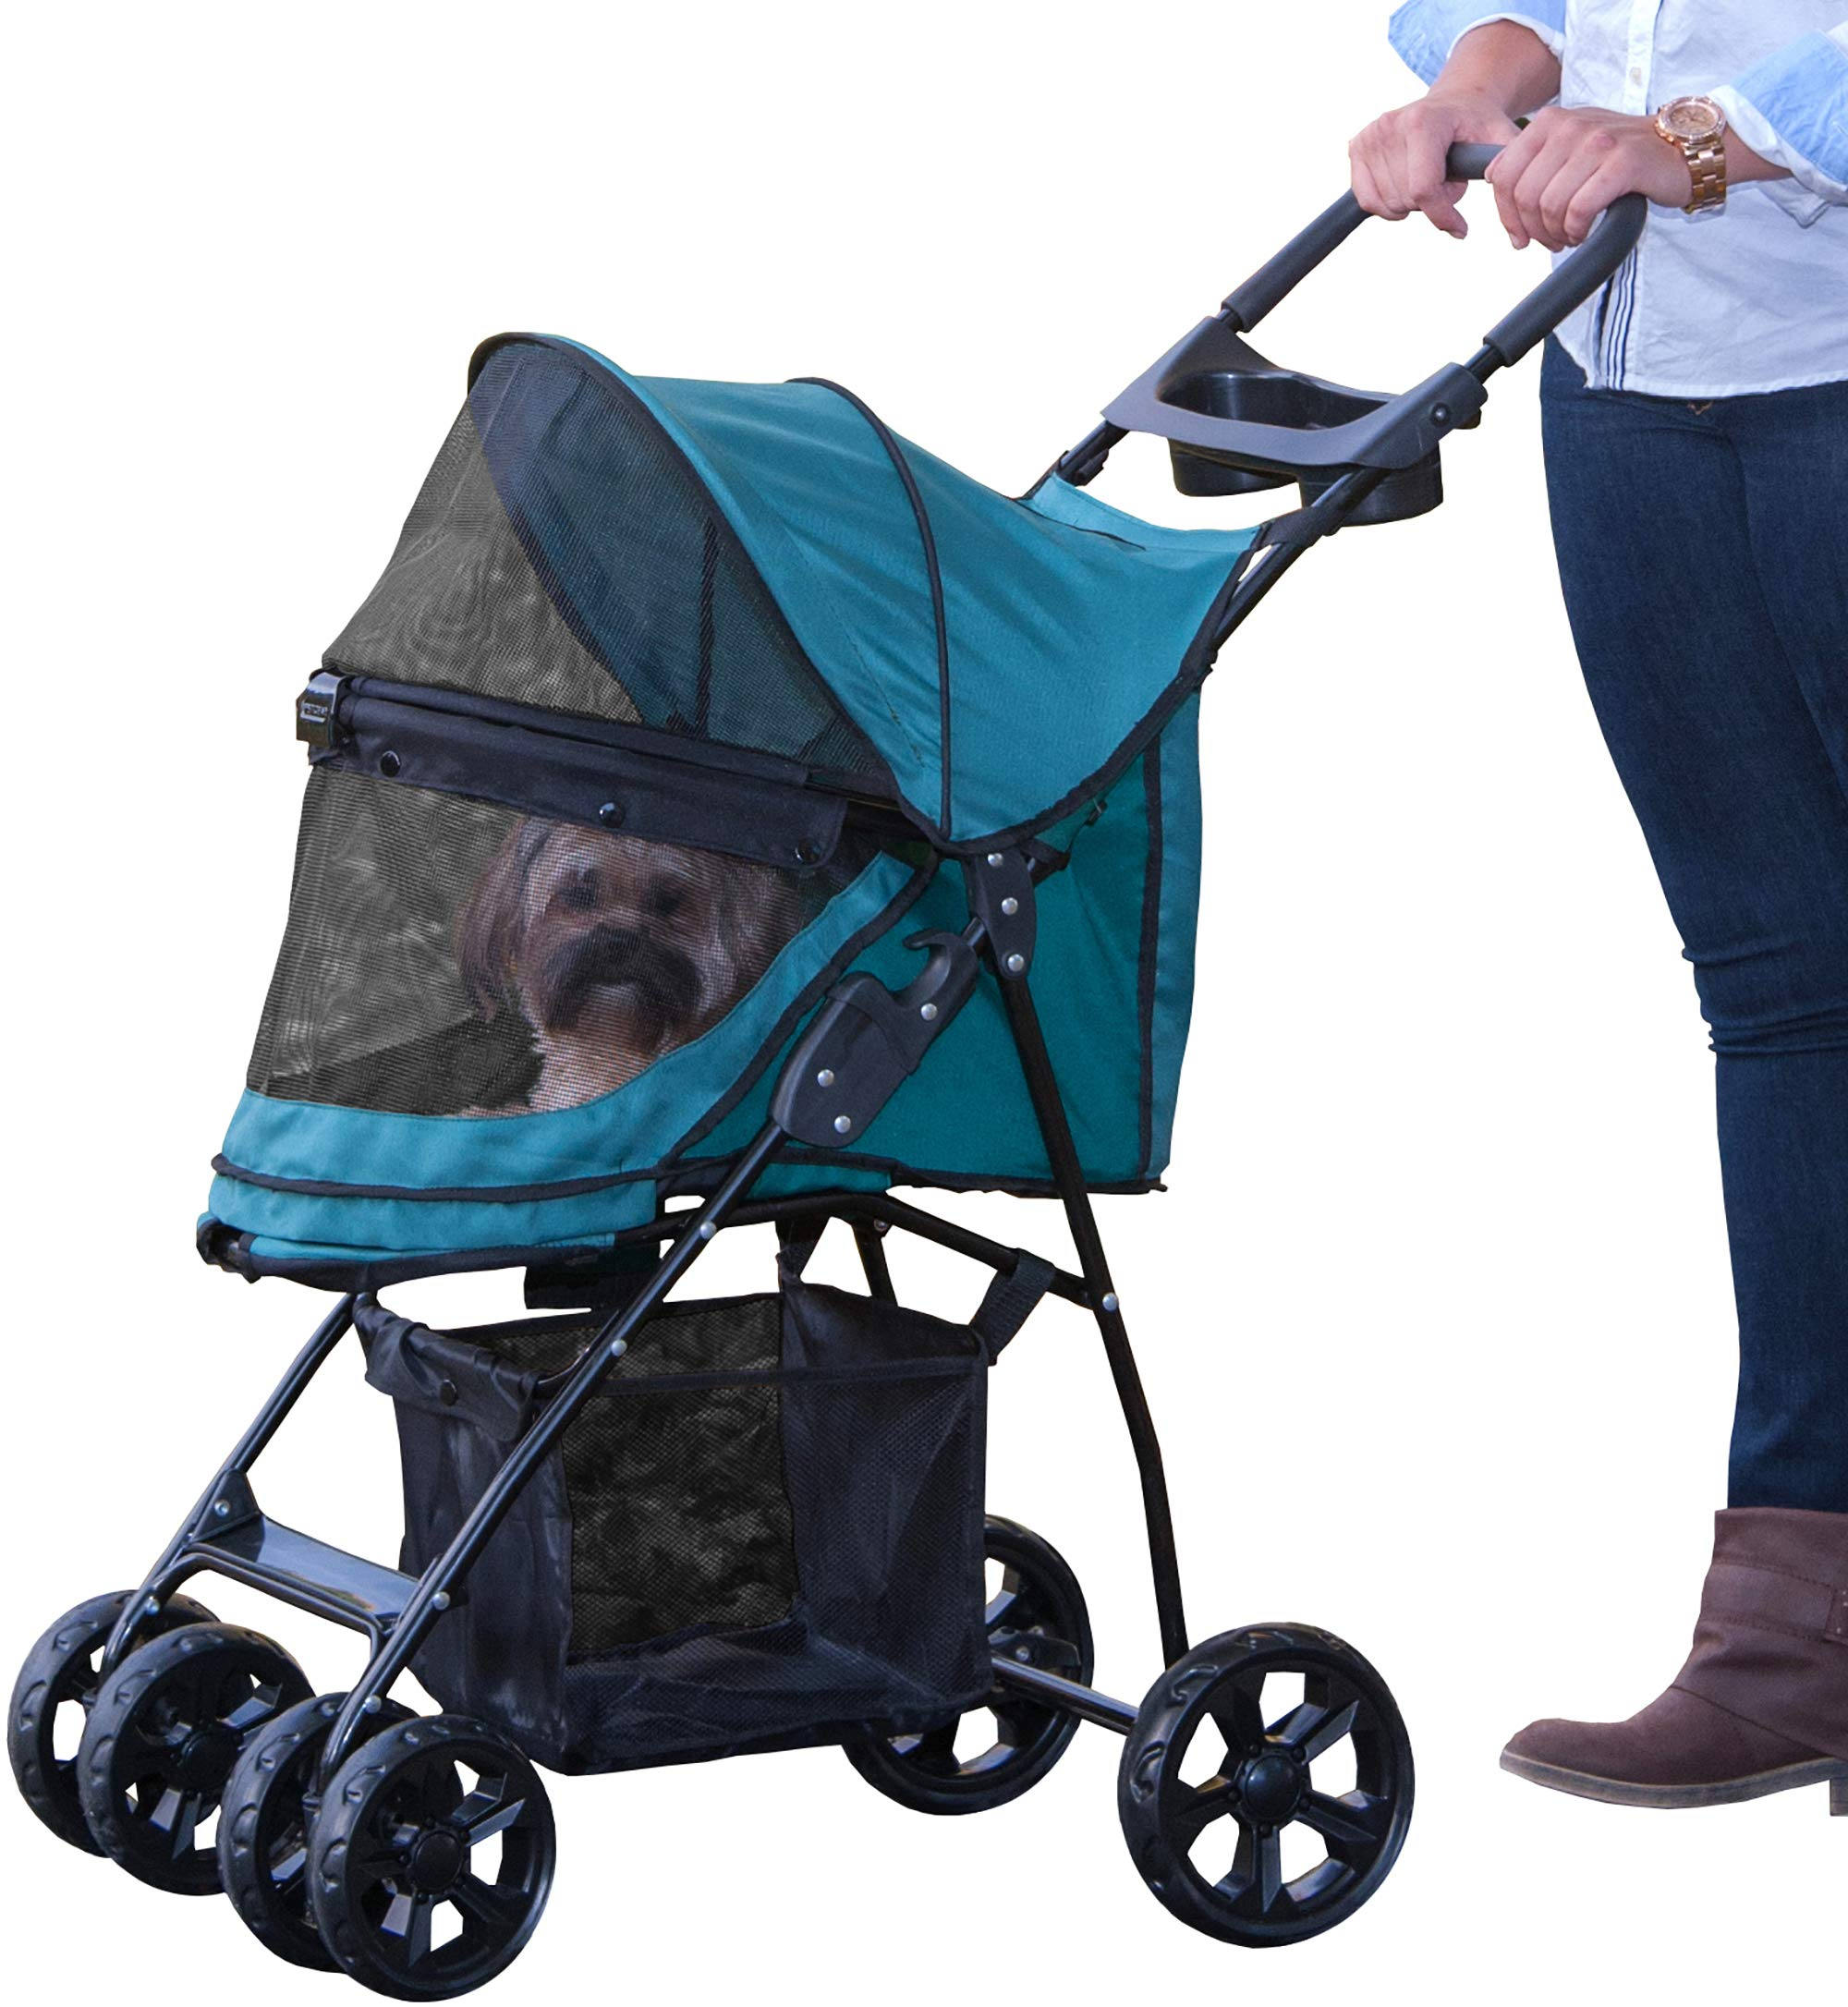 Pet Gear No-Zip Happy Trails Lite Pet Stroller, Zipperless Entry, Pine Green